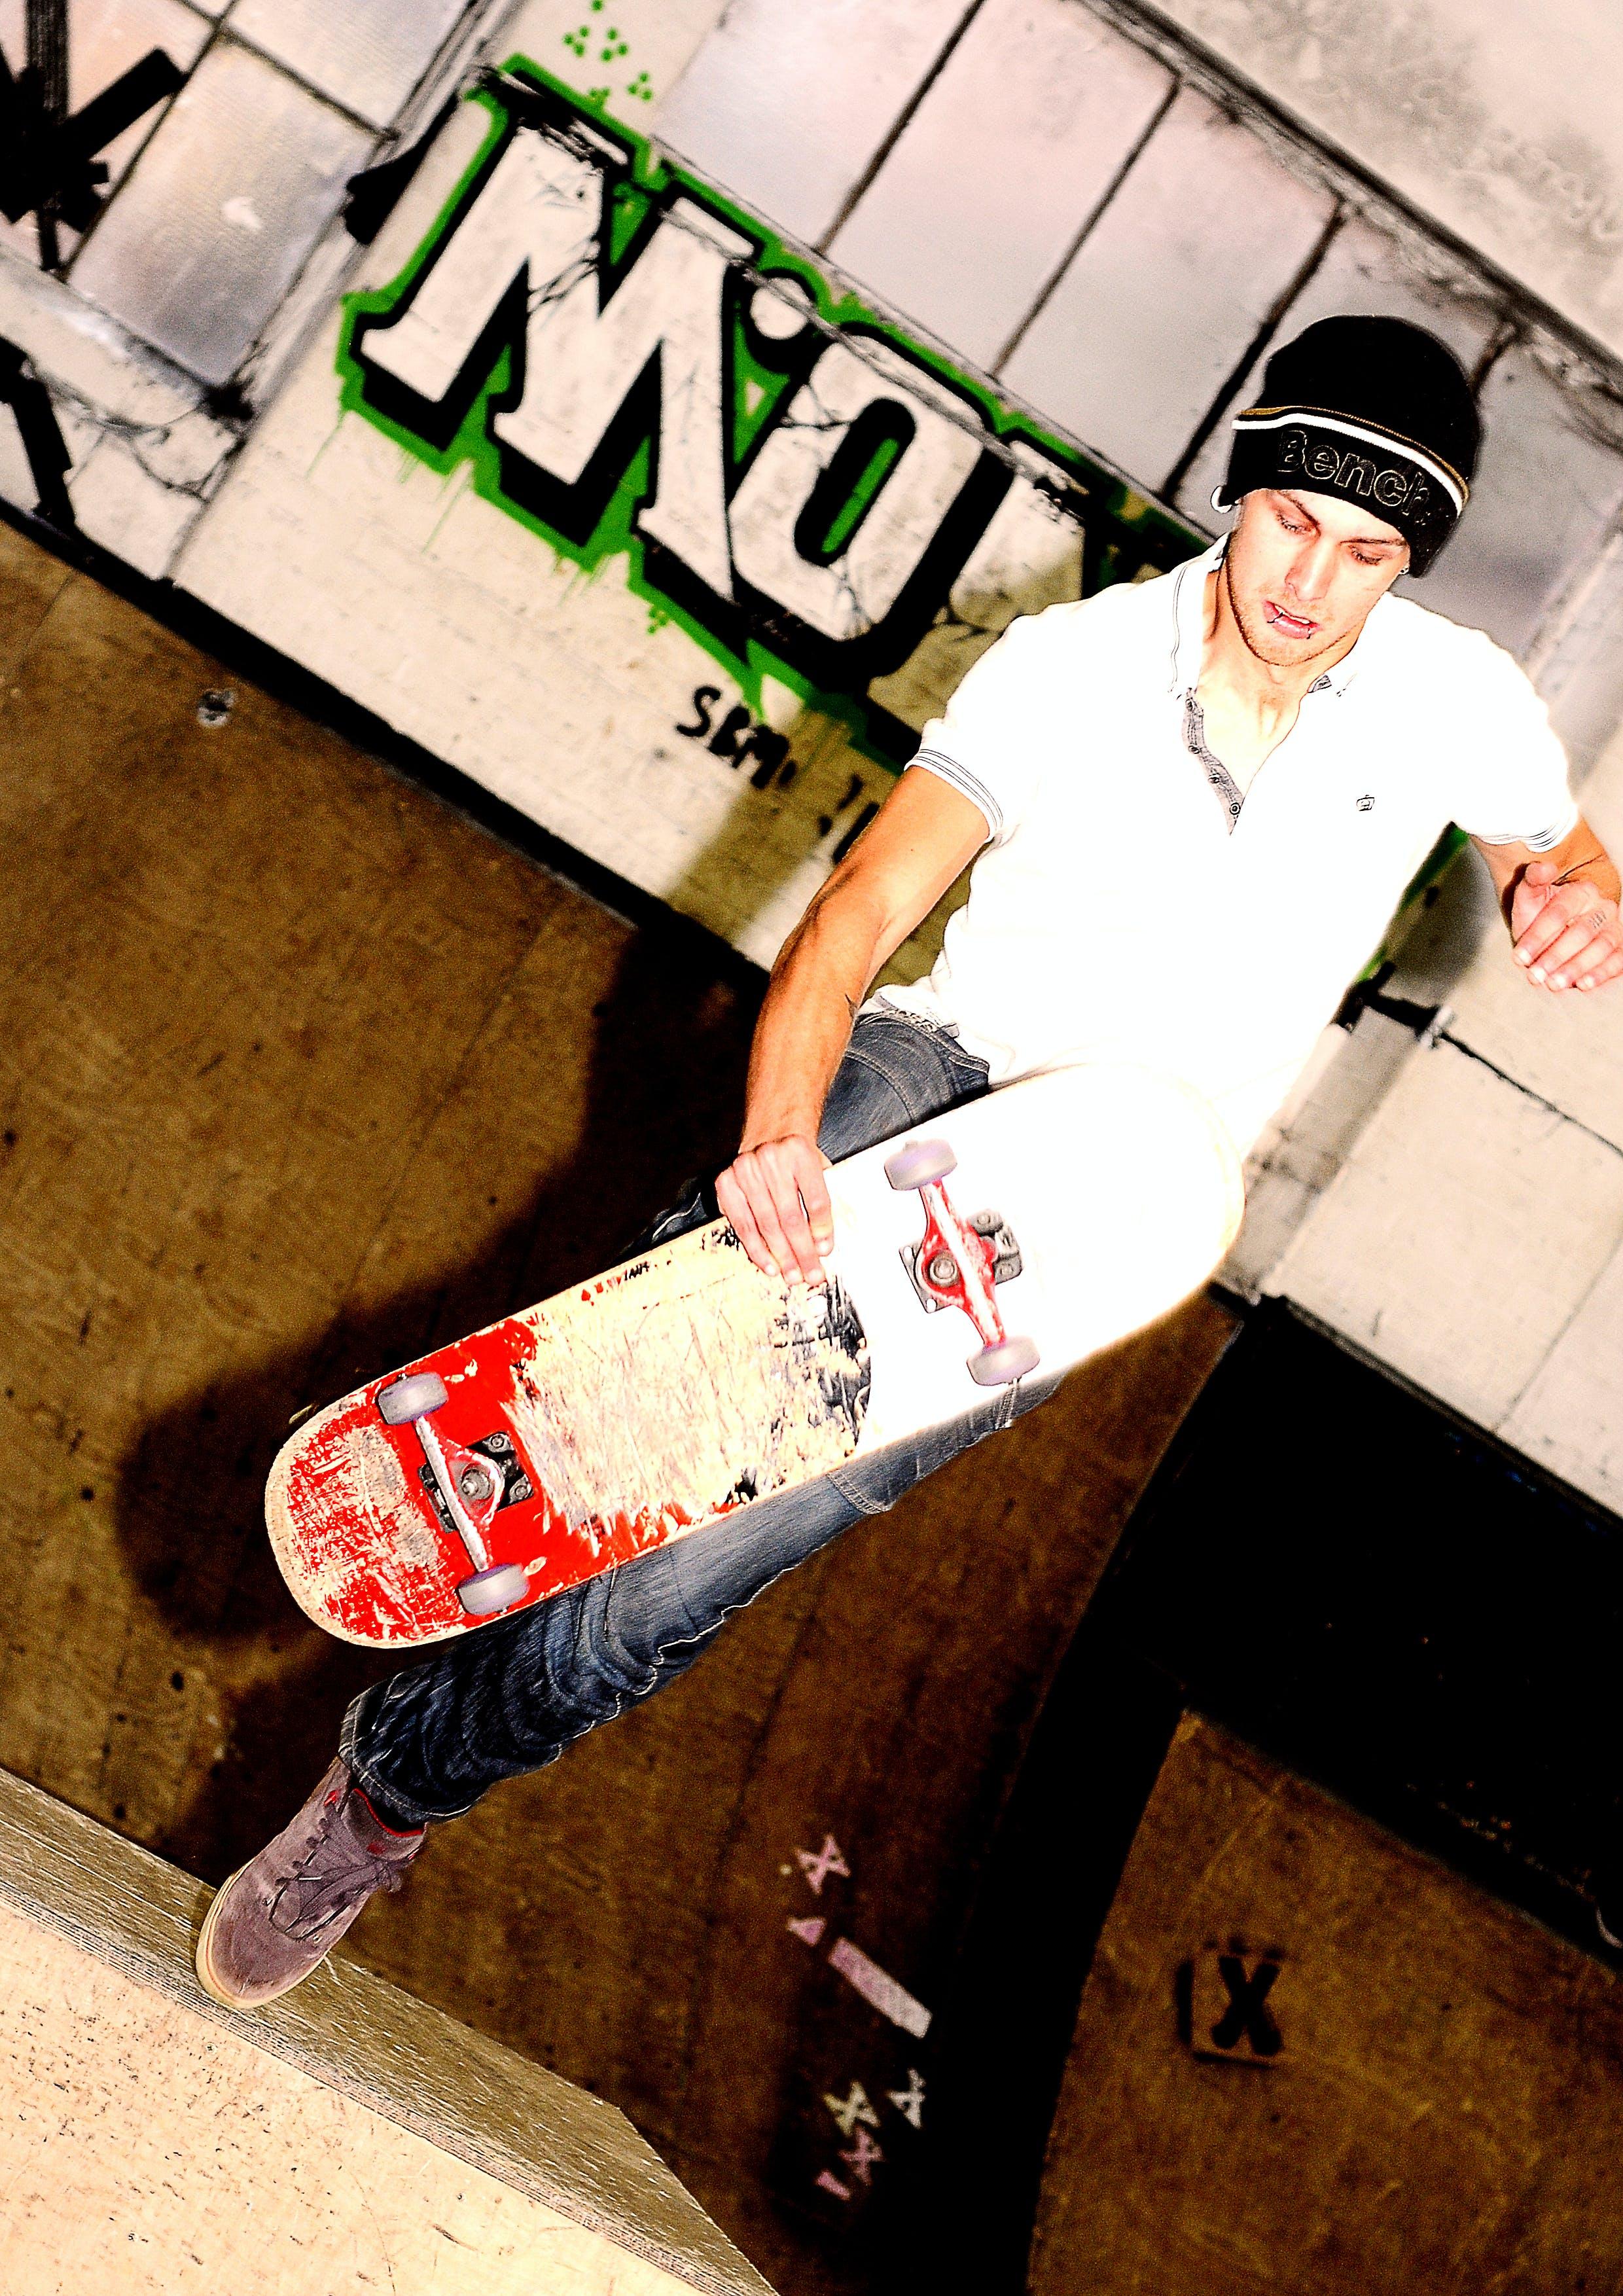 Free stock photo of graffiti, skateboarder